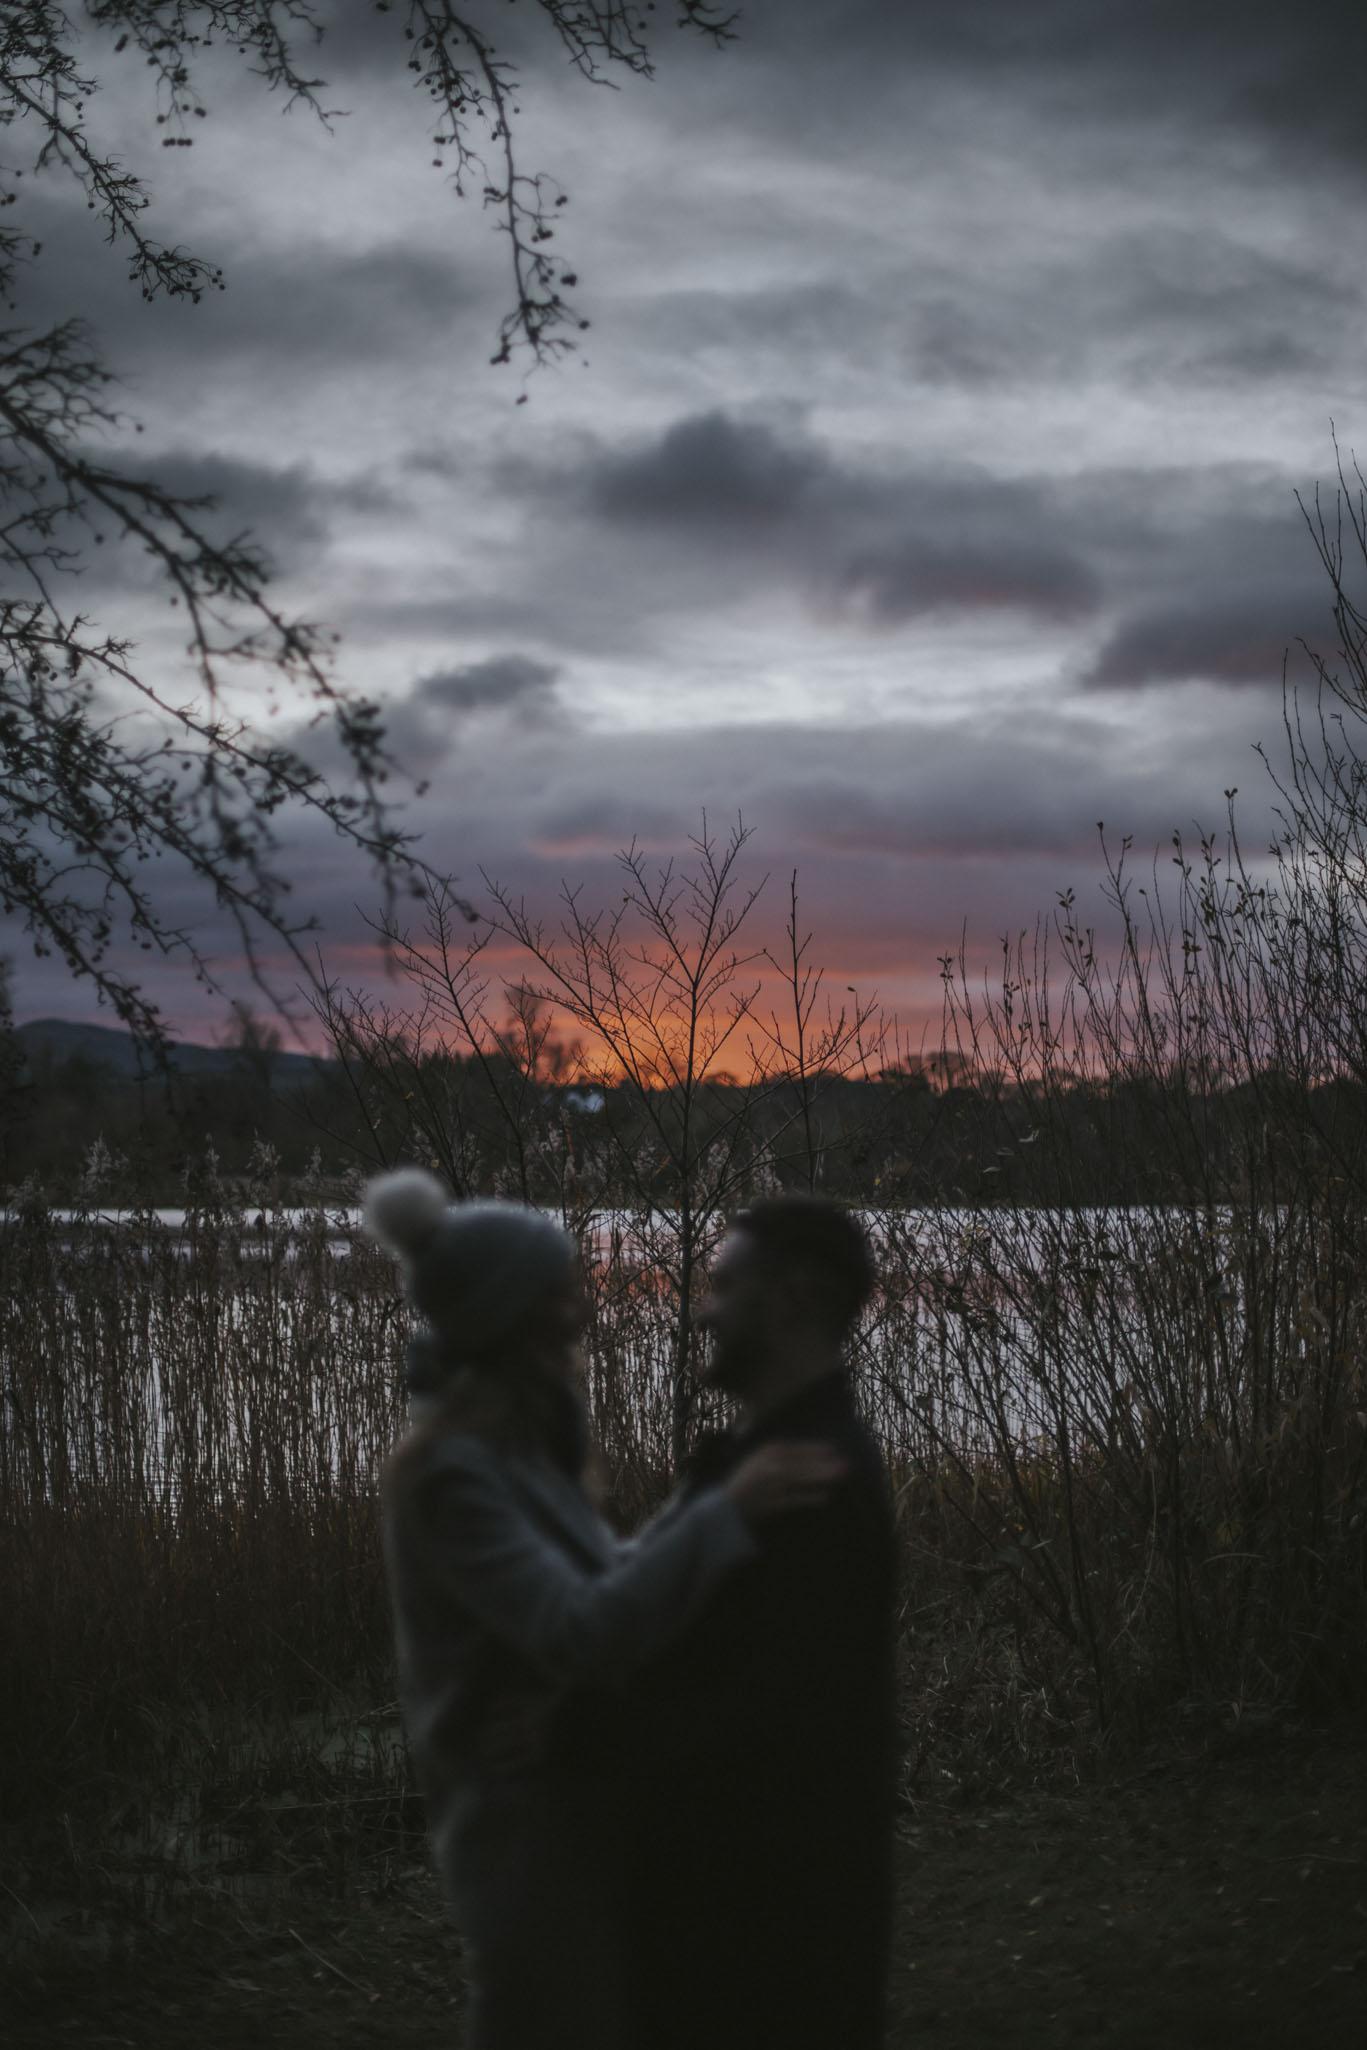 Edinburgh Surprise Wedding Proposal | Duddingston Loch | Holyrood Park Engagement Photography | Scottish Photographer